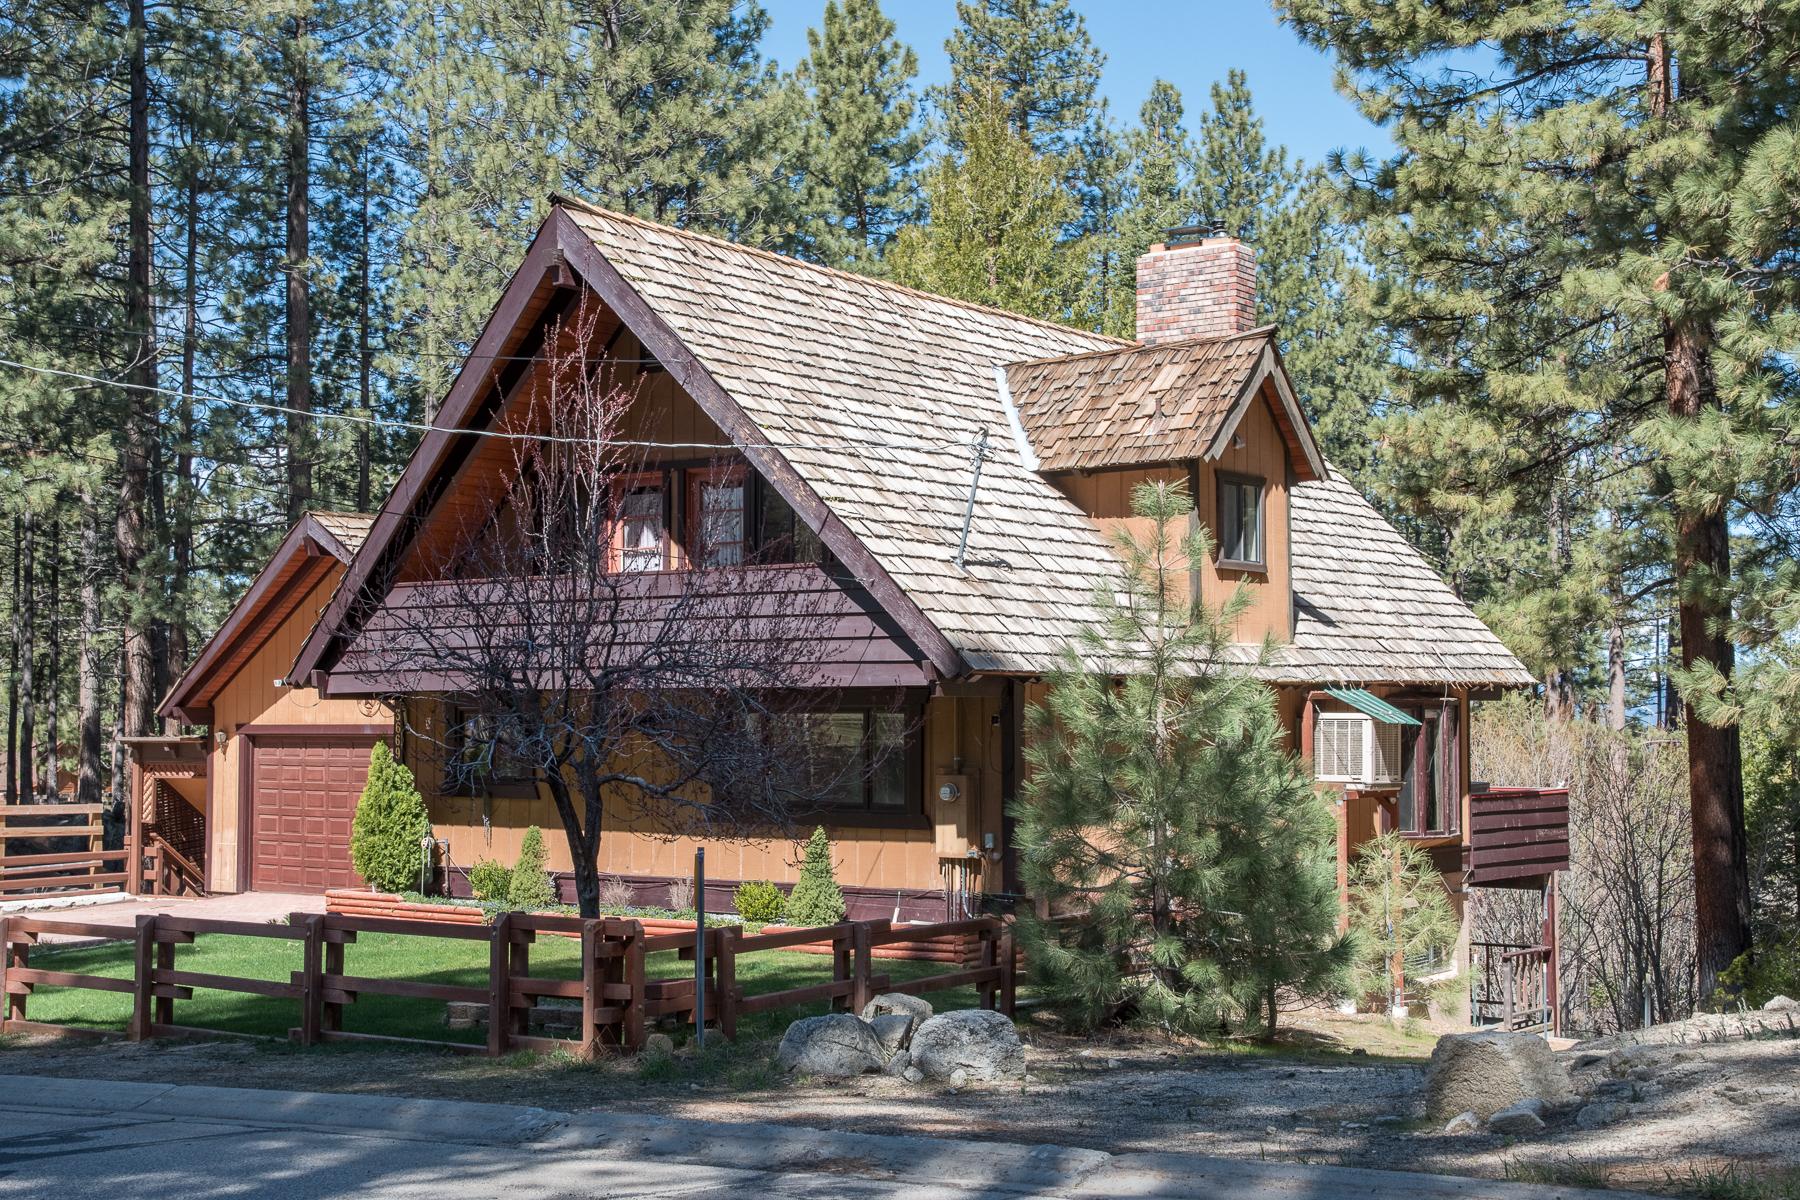 enjoyment deck story tub hot summer for living vacation den heavenly rentals lake cabins large bear once tahoe cabin rent